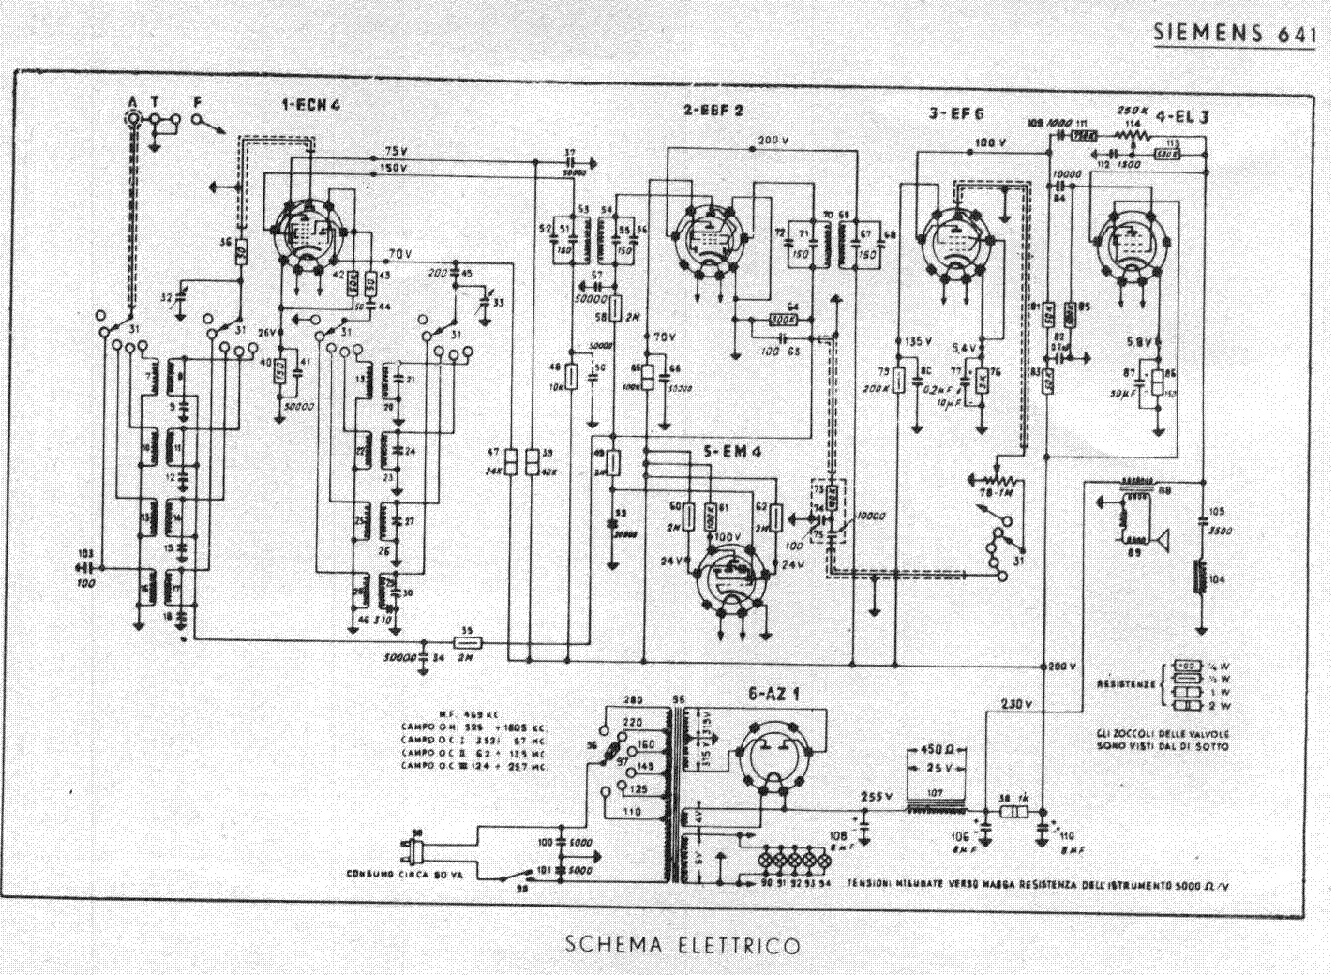 SIEMENS 641 Service Manual download, schematics, eeprom